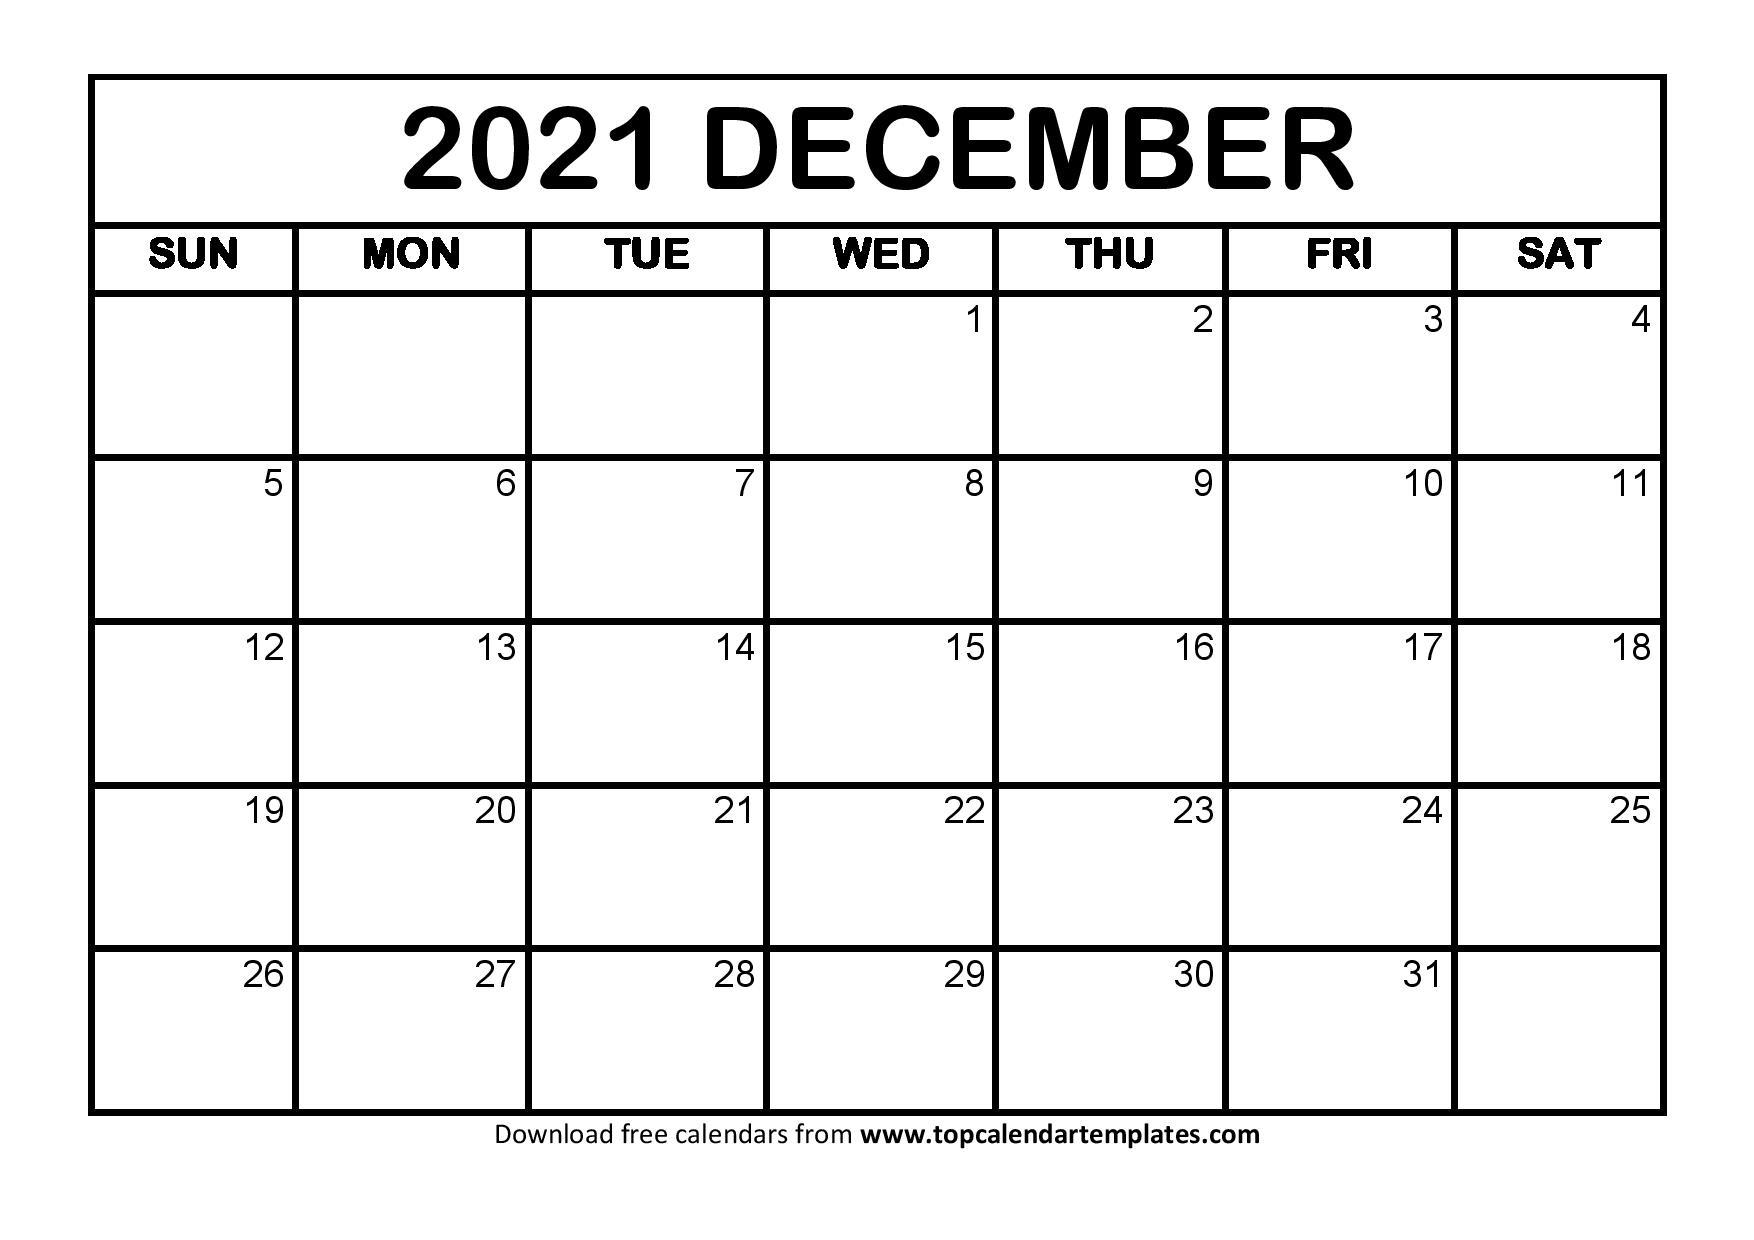 December 2021 Printable Calendar - Monthly Templates December Calendar Of 2021